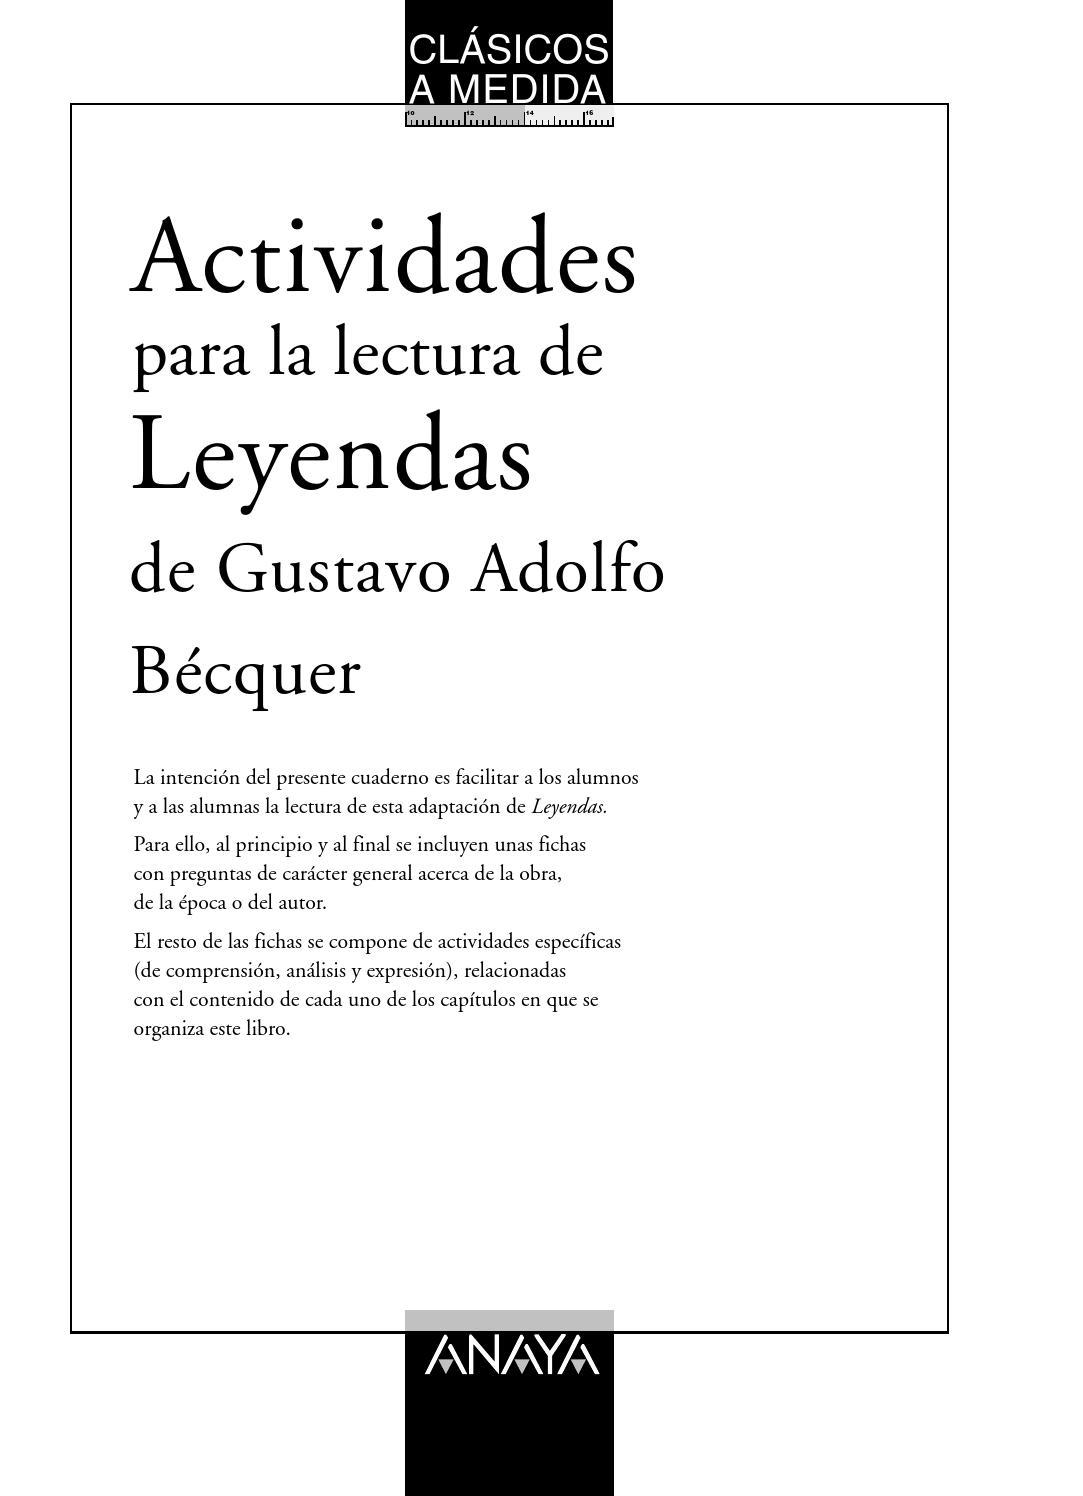 Leyendas, De Bécquer (actividades Para La Lectura, Anaya